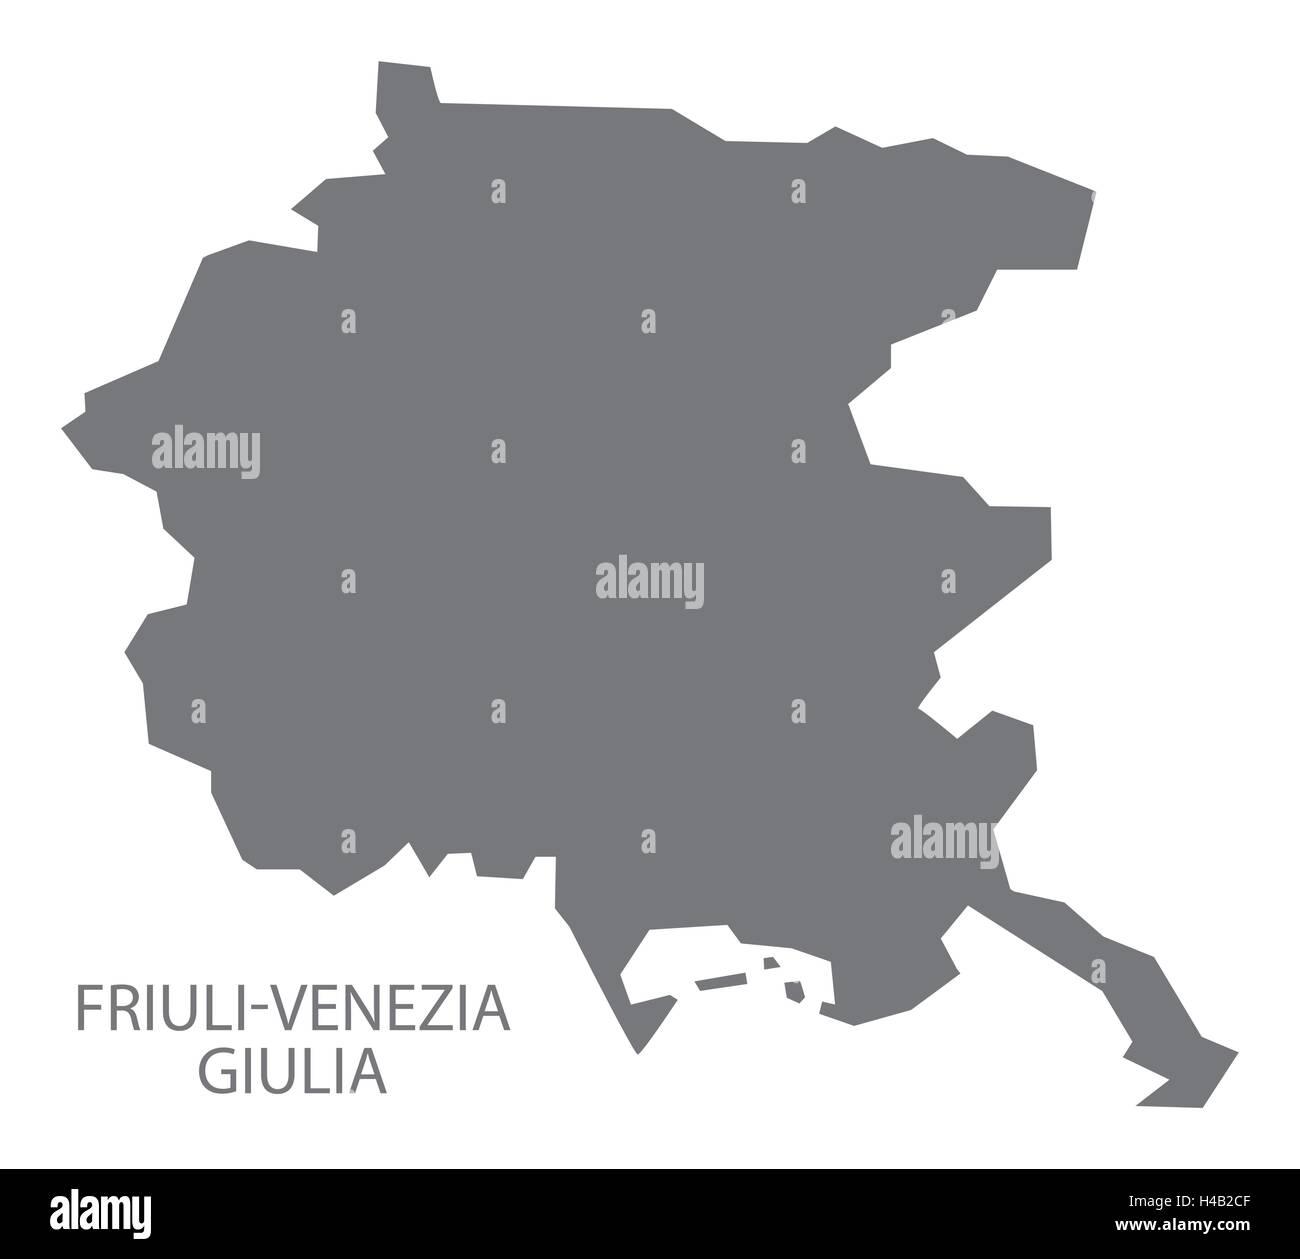 FriuliVenezia Giulia Italy Map in grey Stock Vector Art